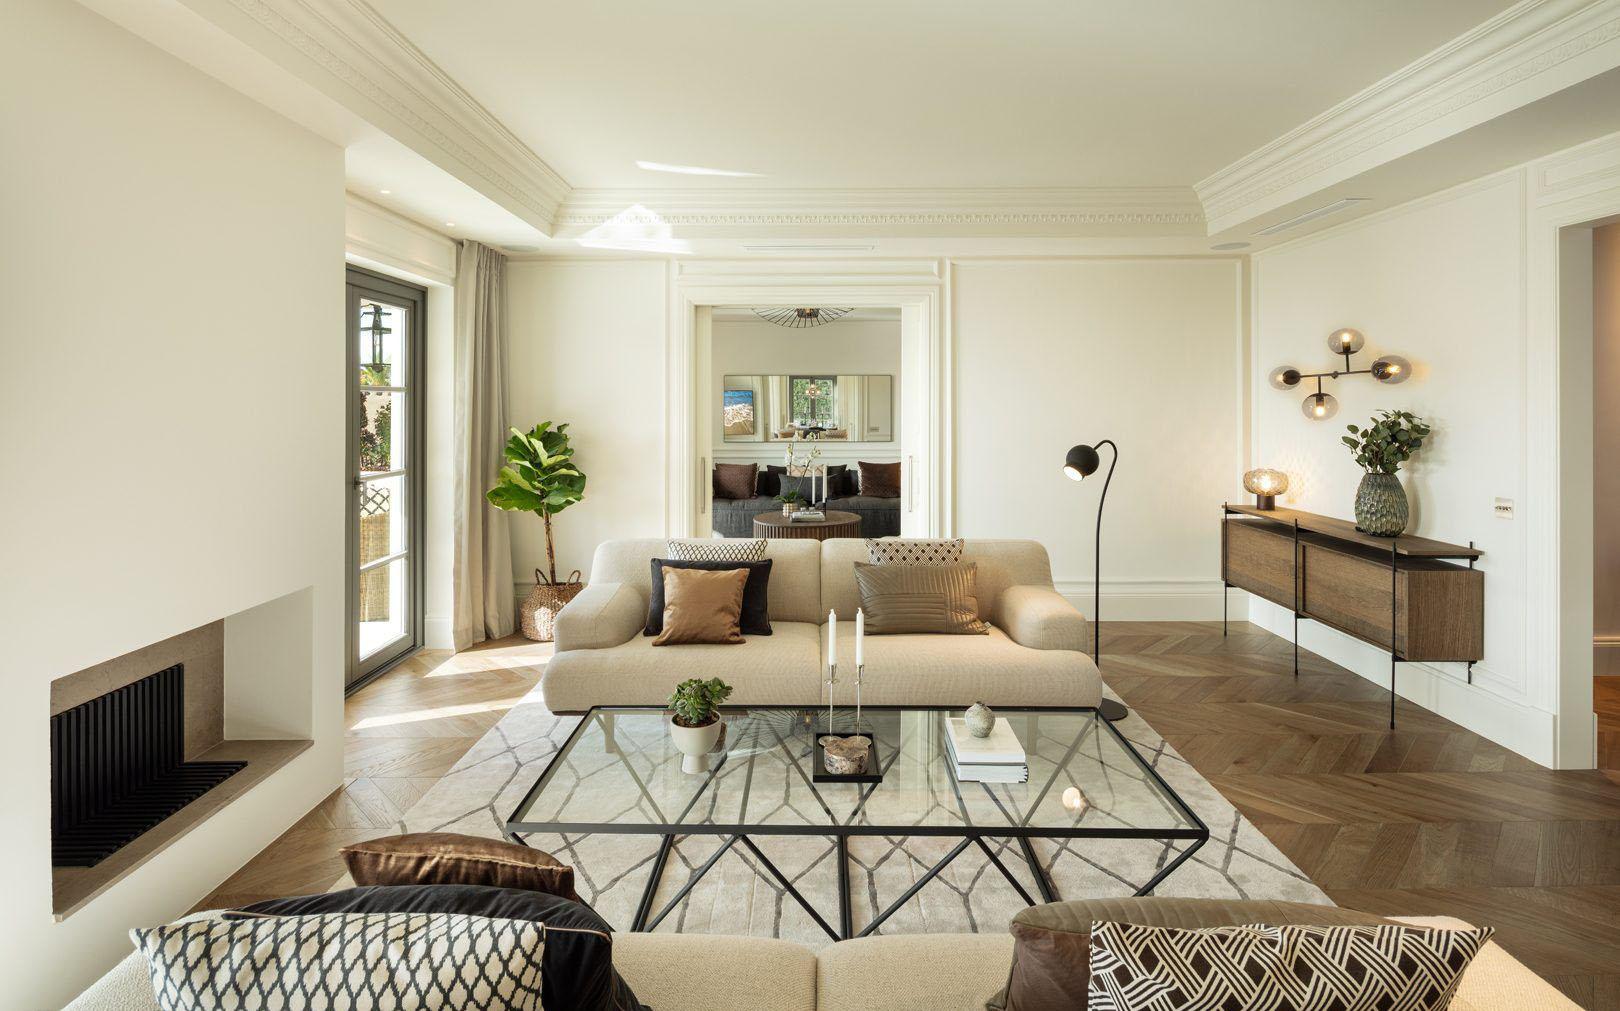 Beautiful living room with hardwood floors laid with a herringbone pattern.